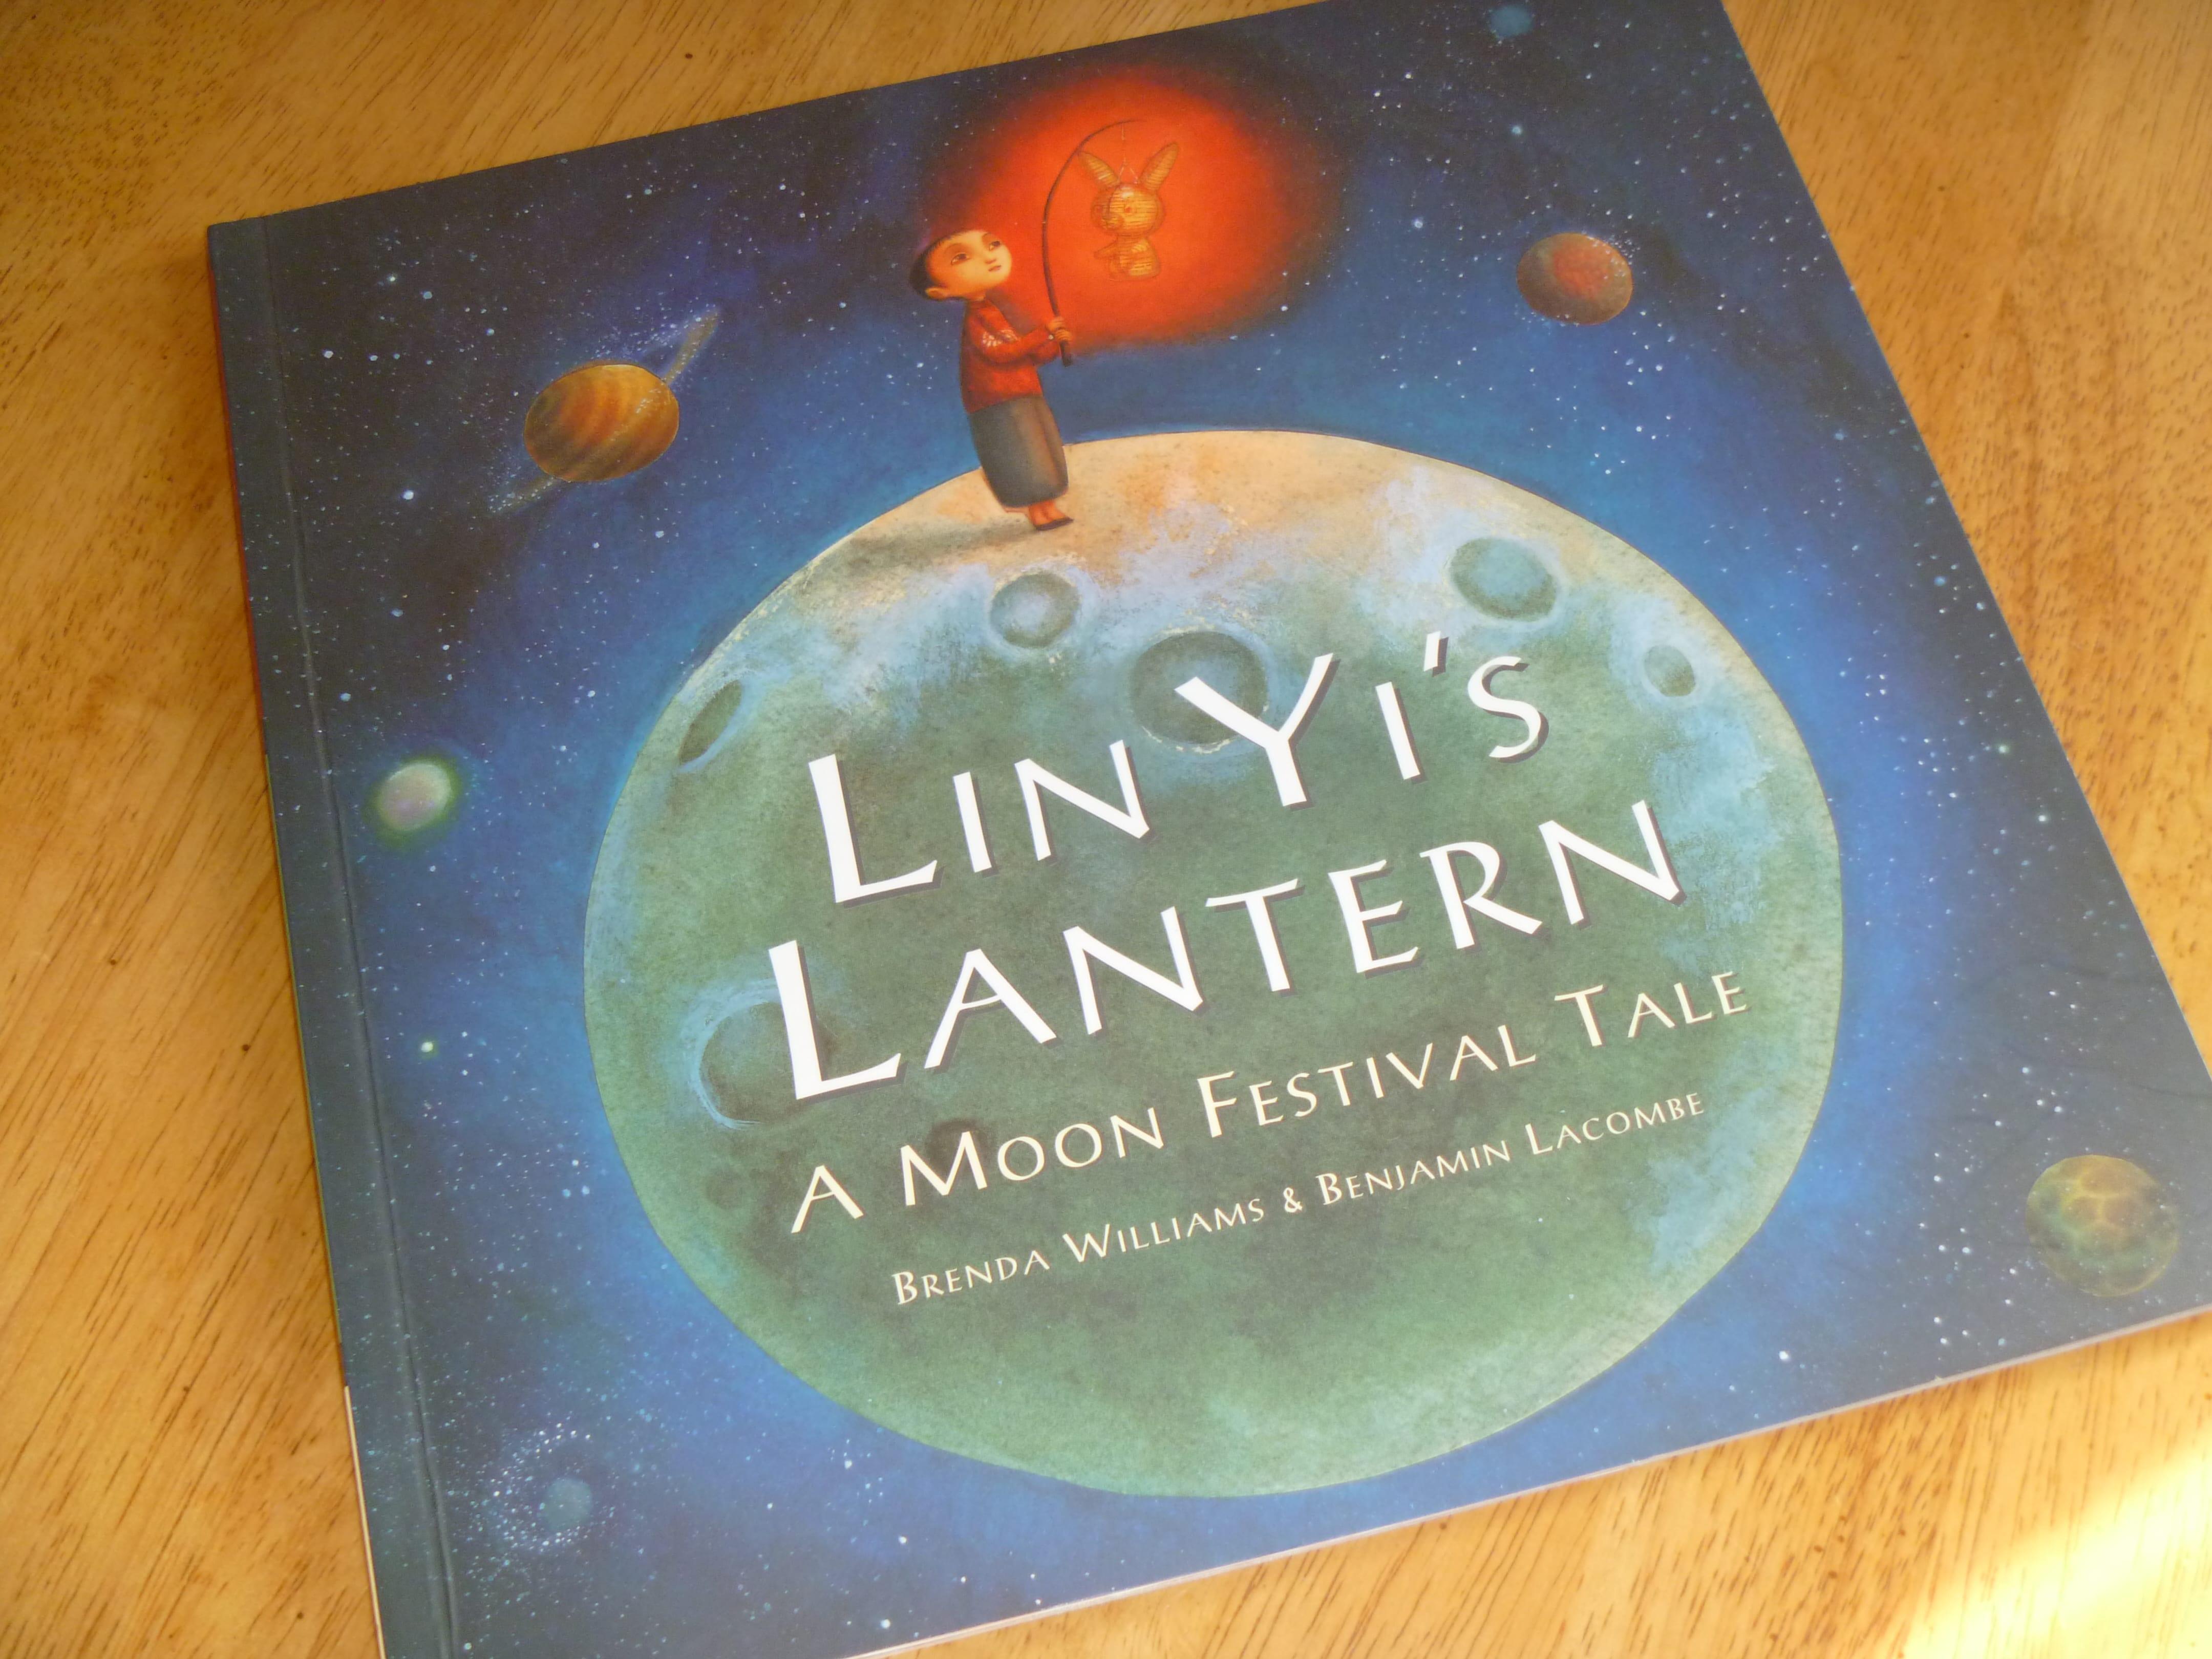 Lin Yi's Lanter